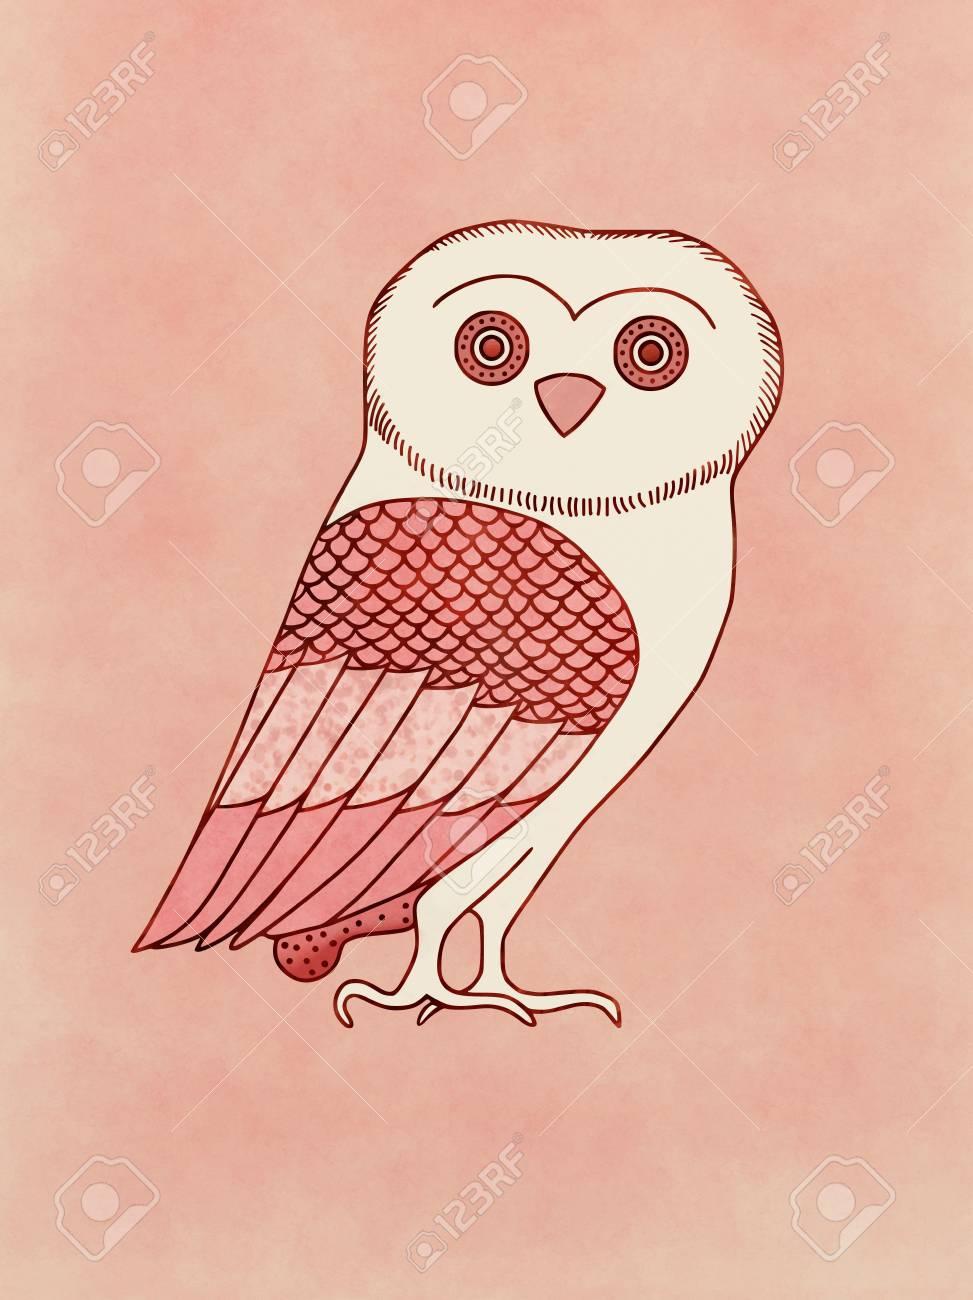 Cute Owl Symbol Of Athena Goddess And Athens Protector